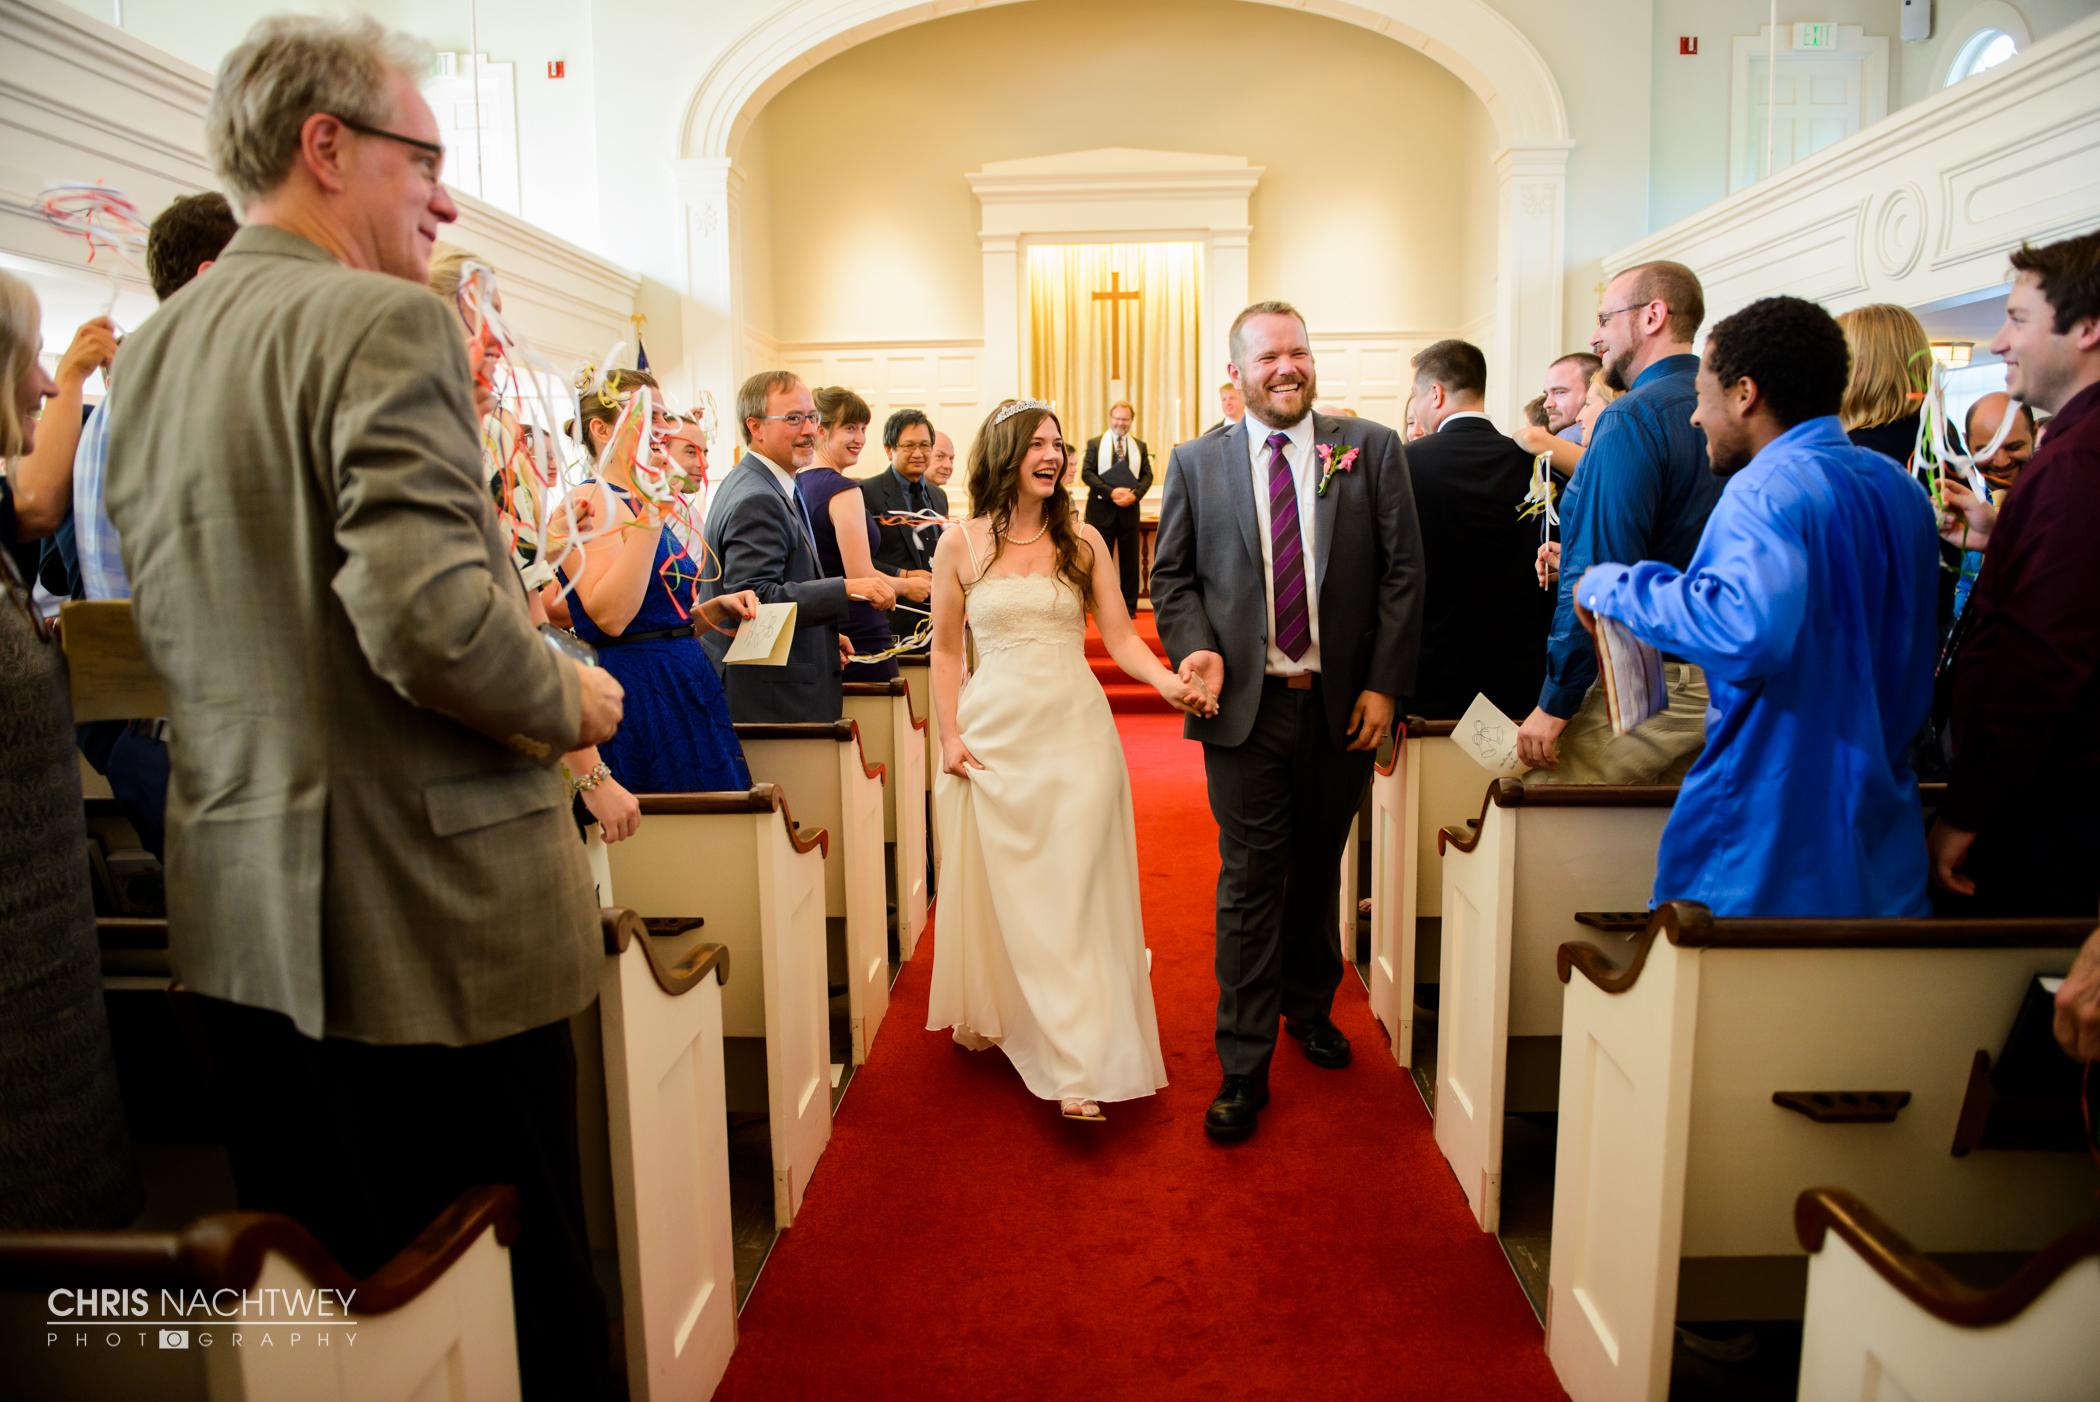 mystic-ct-wedding-photographers-chris-nachtwey-2016.jpg